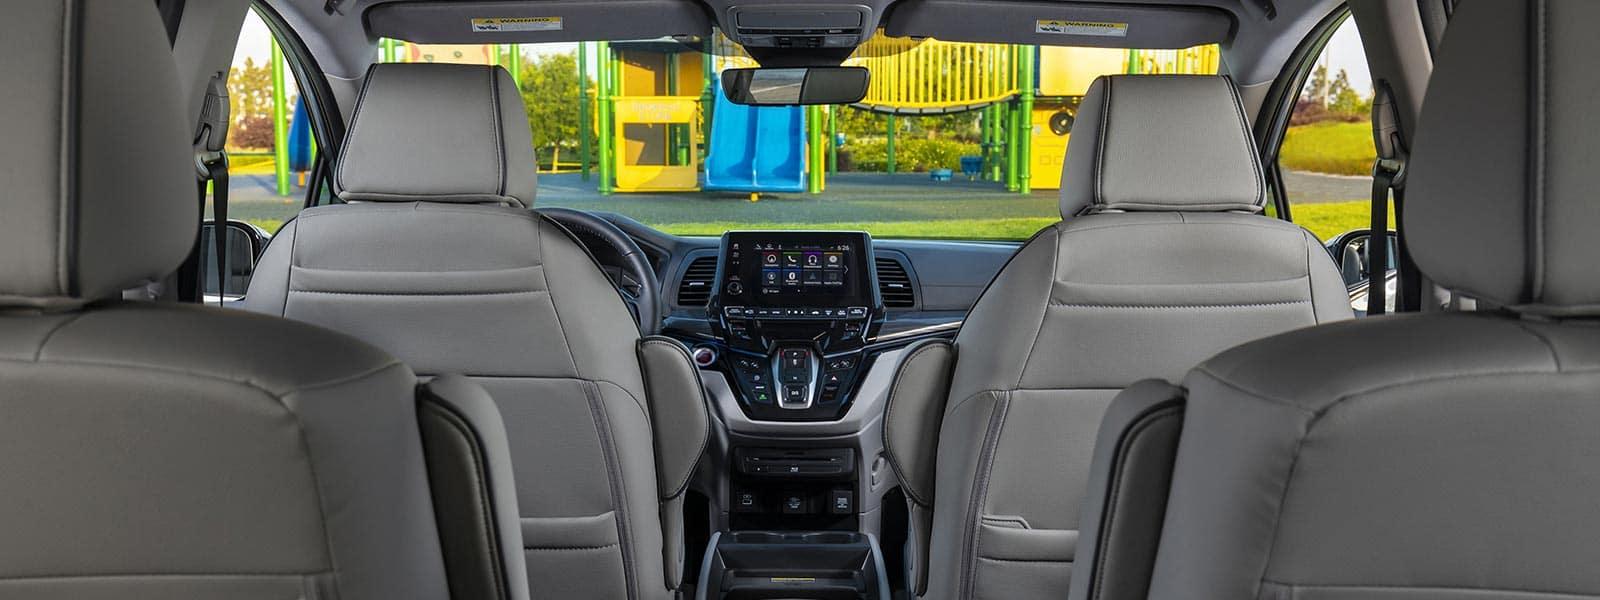 Buy or lease new Honda Odyssey minivan Martinsville Virginia